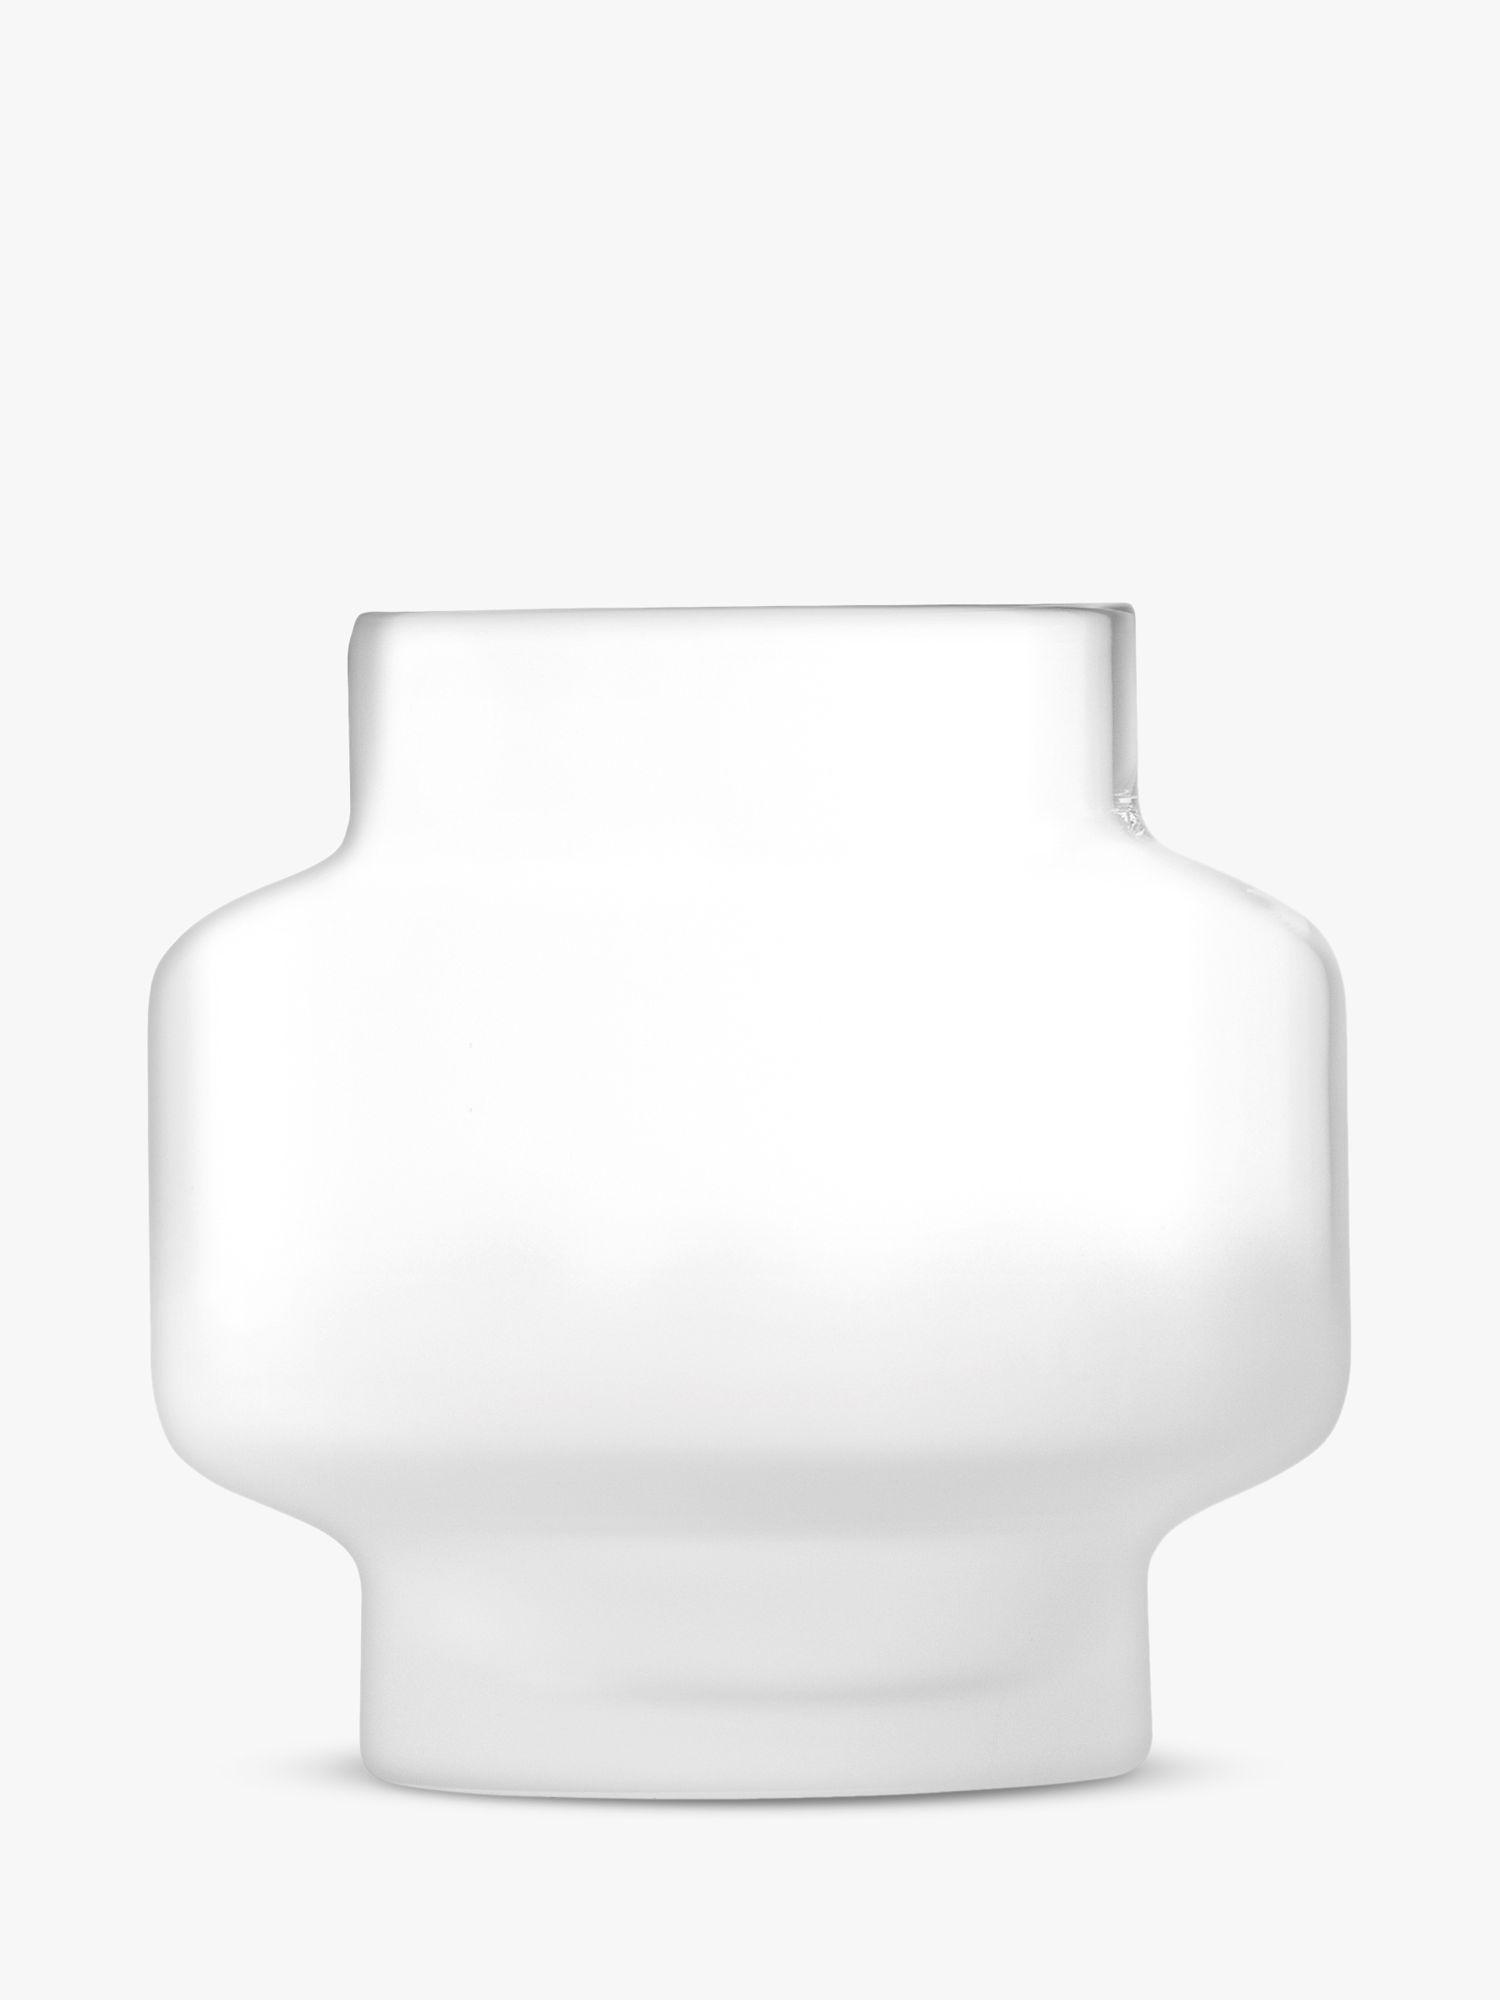 LSA International LSA International Mist Vase, H19cm